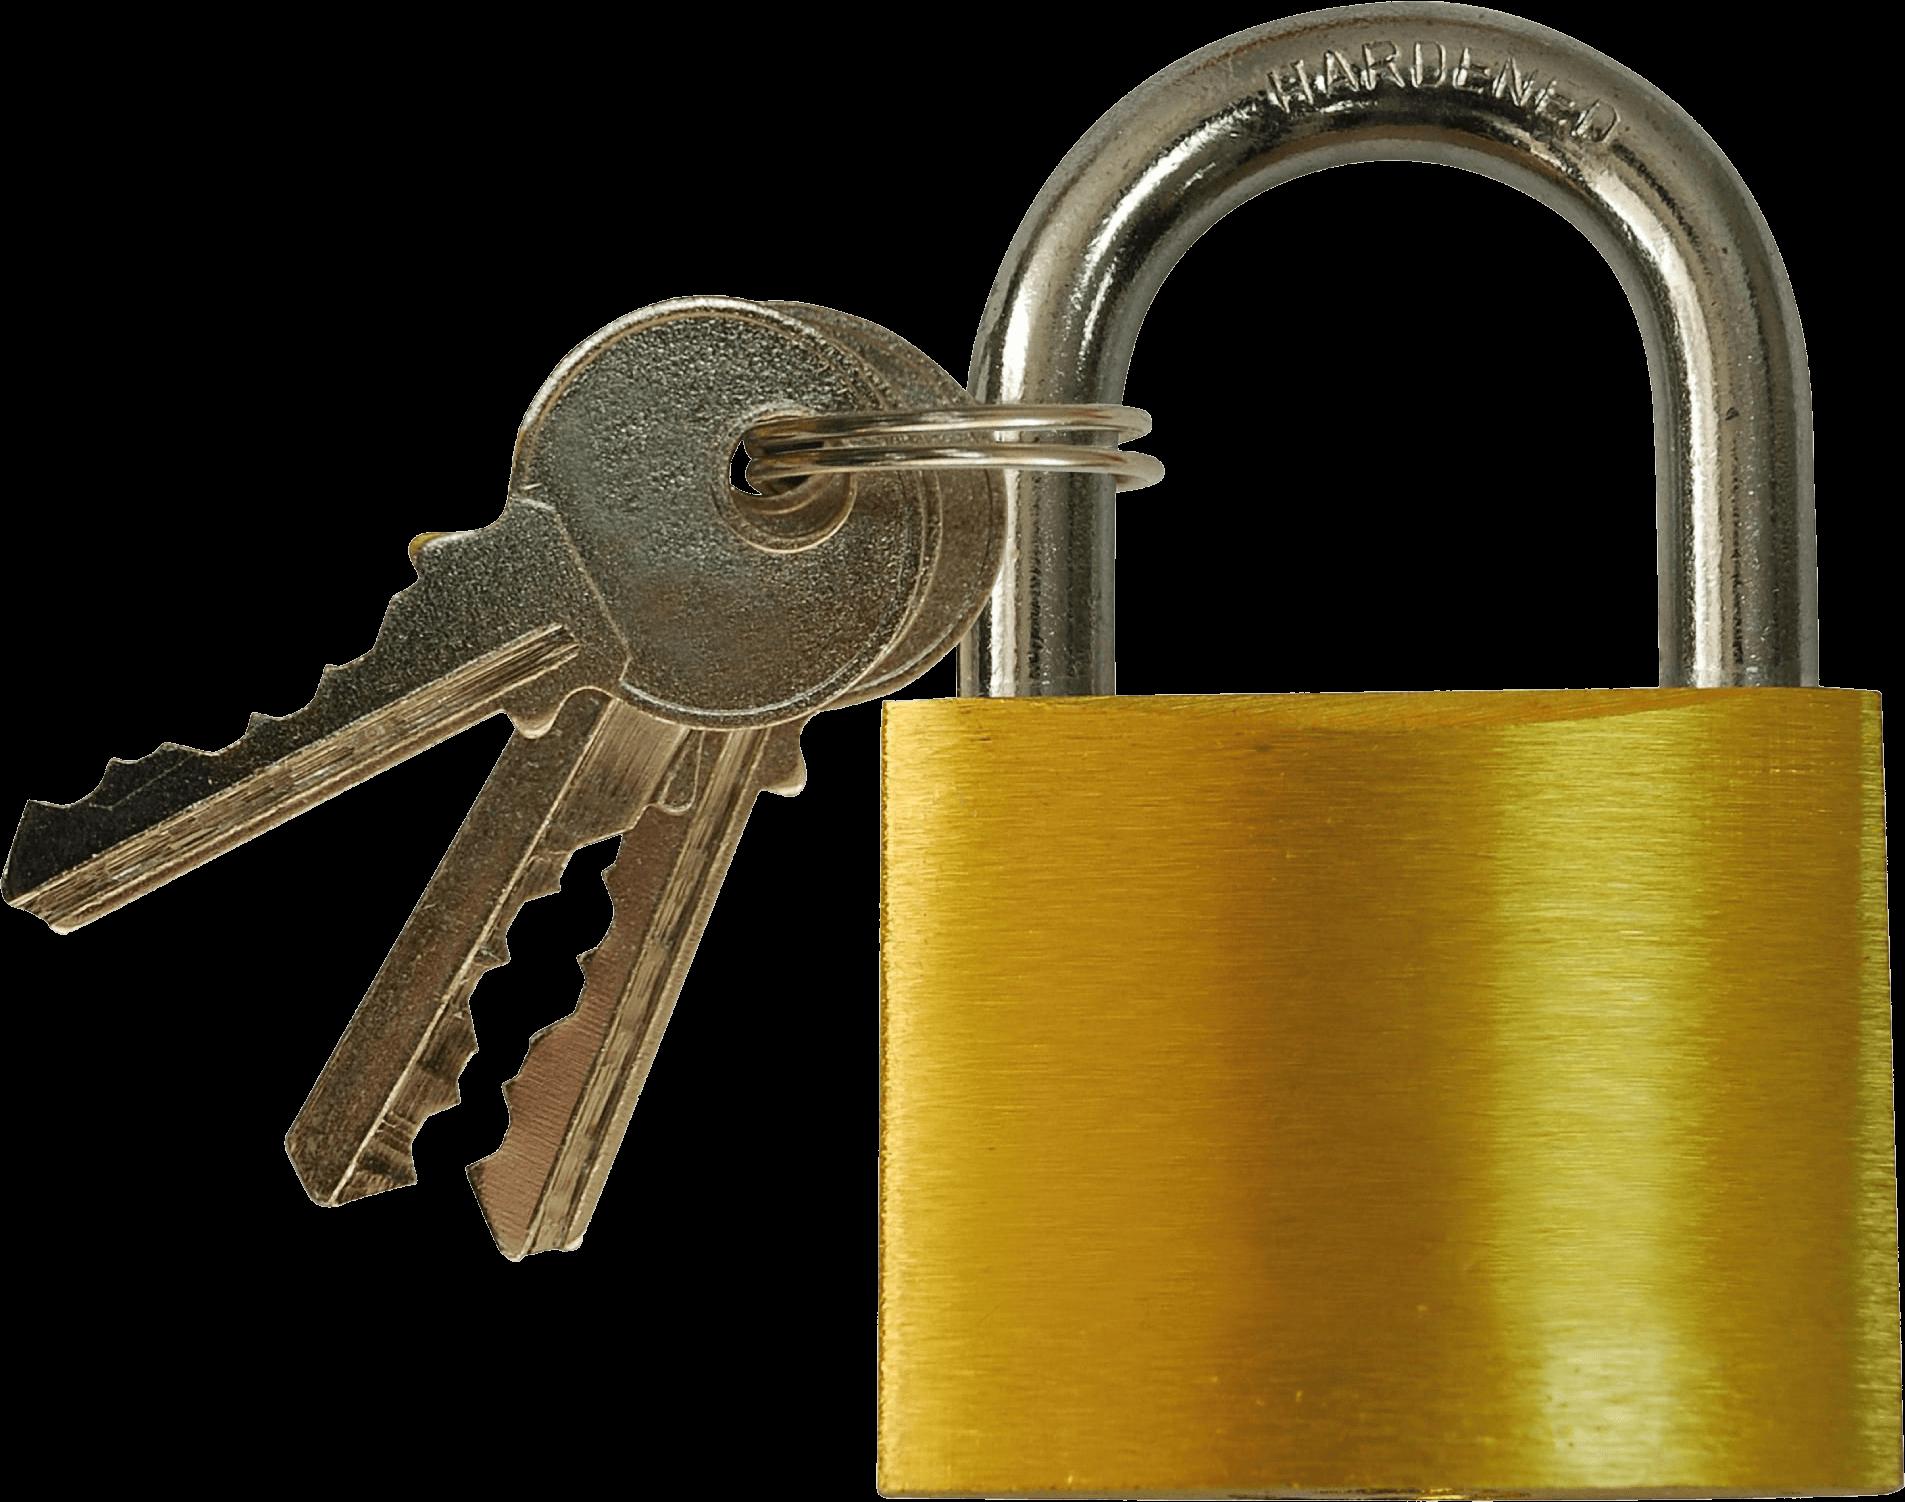 Lock clipart lock chain. Padlock and keys transparent